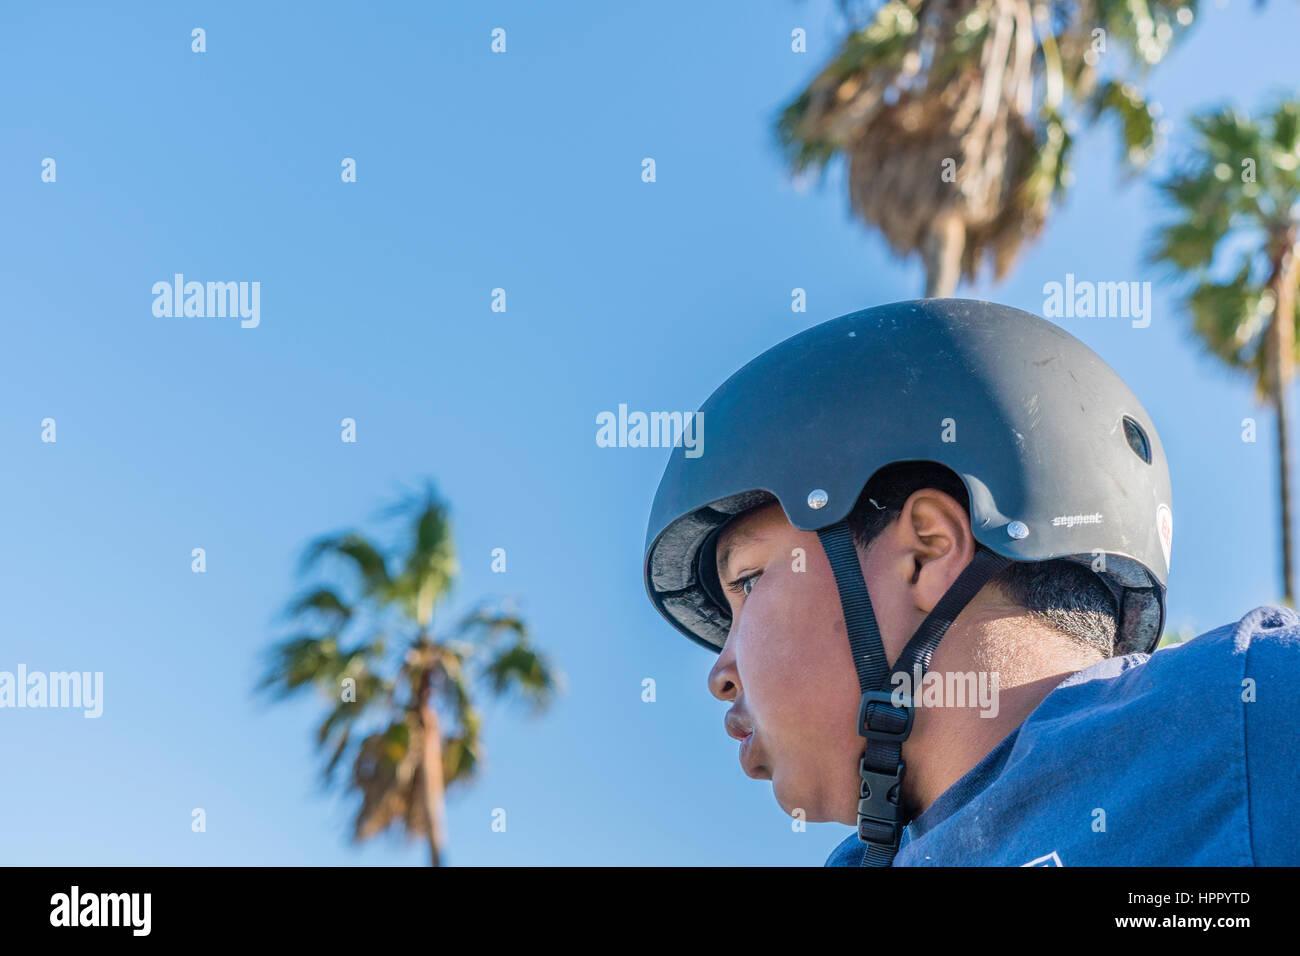 Young BMX riding boy wearing helmet. - Stock Image